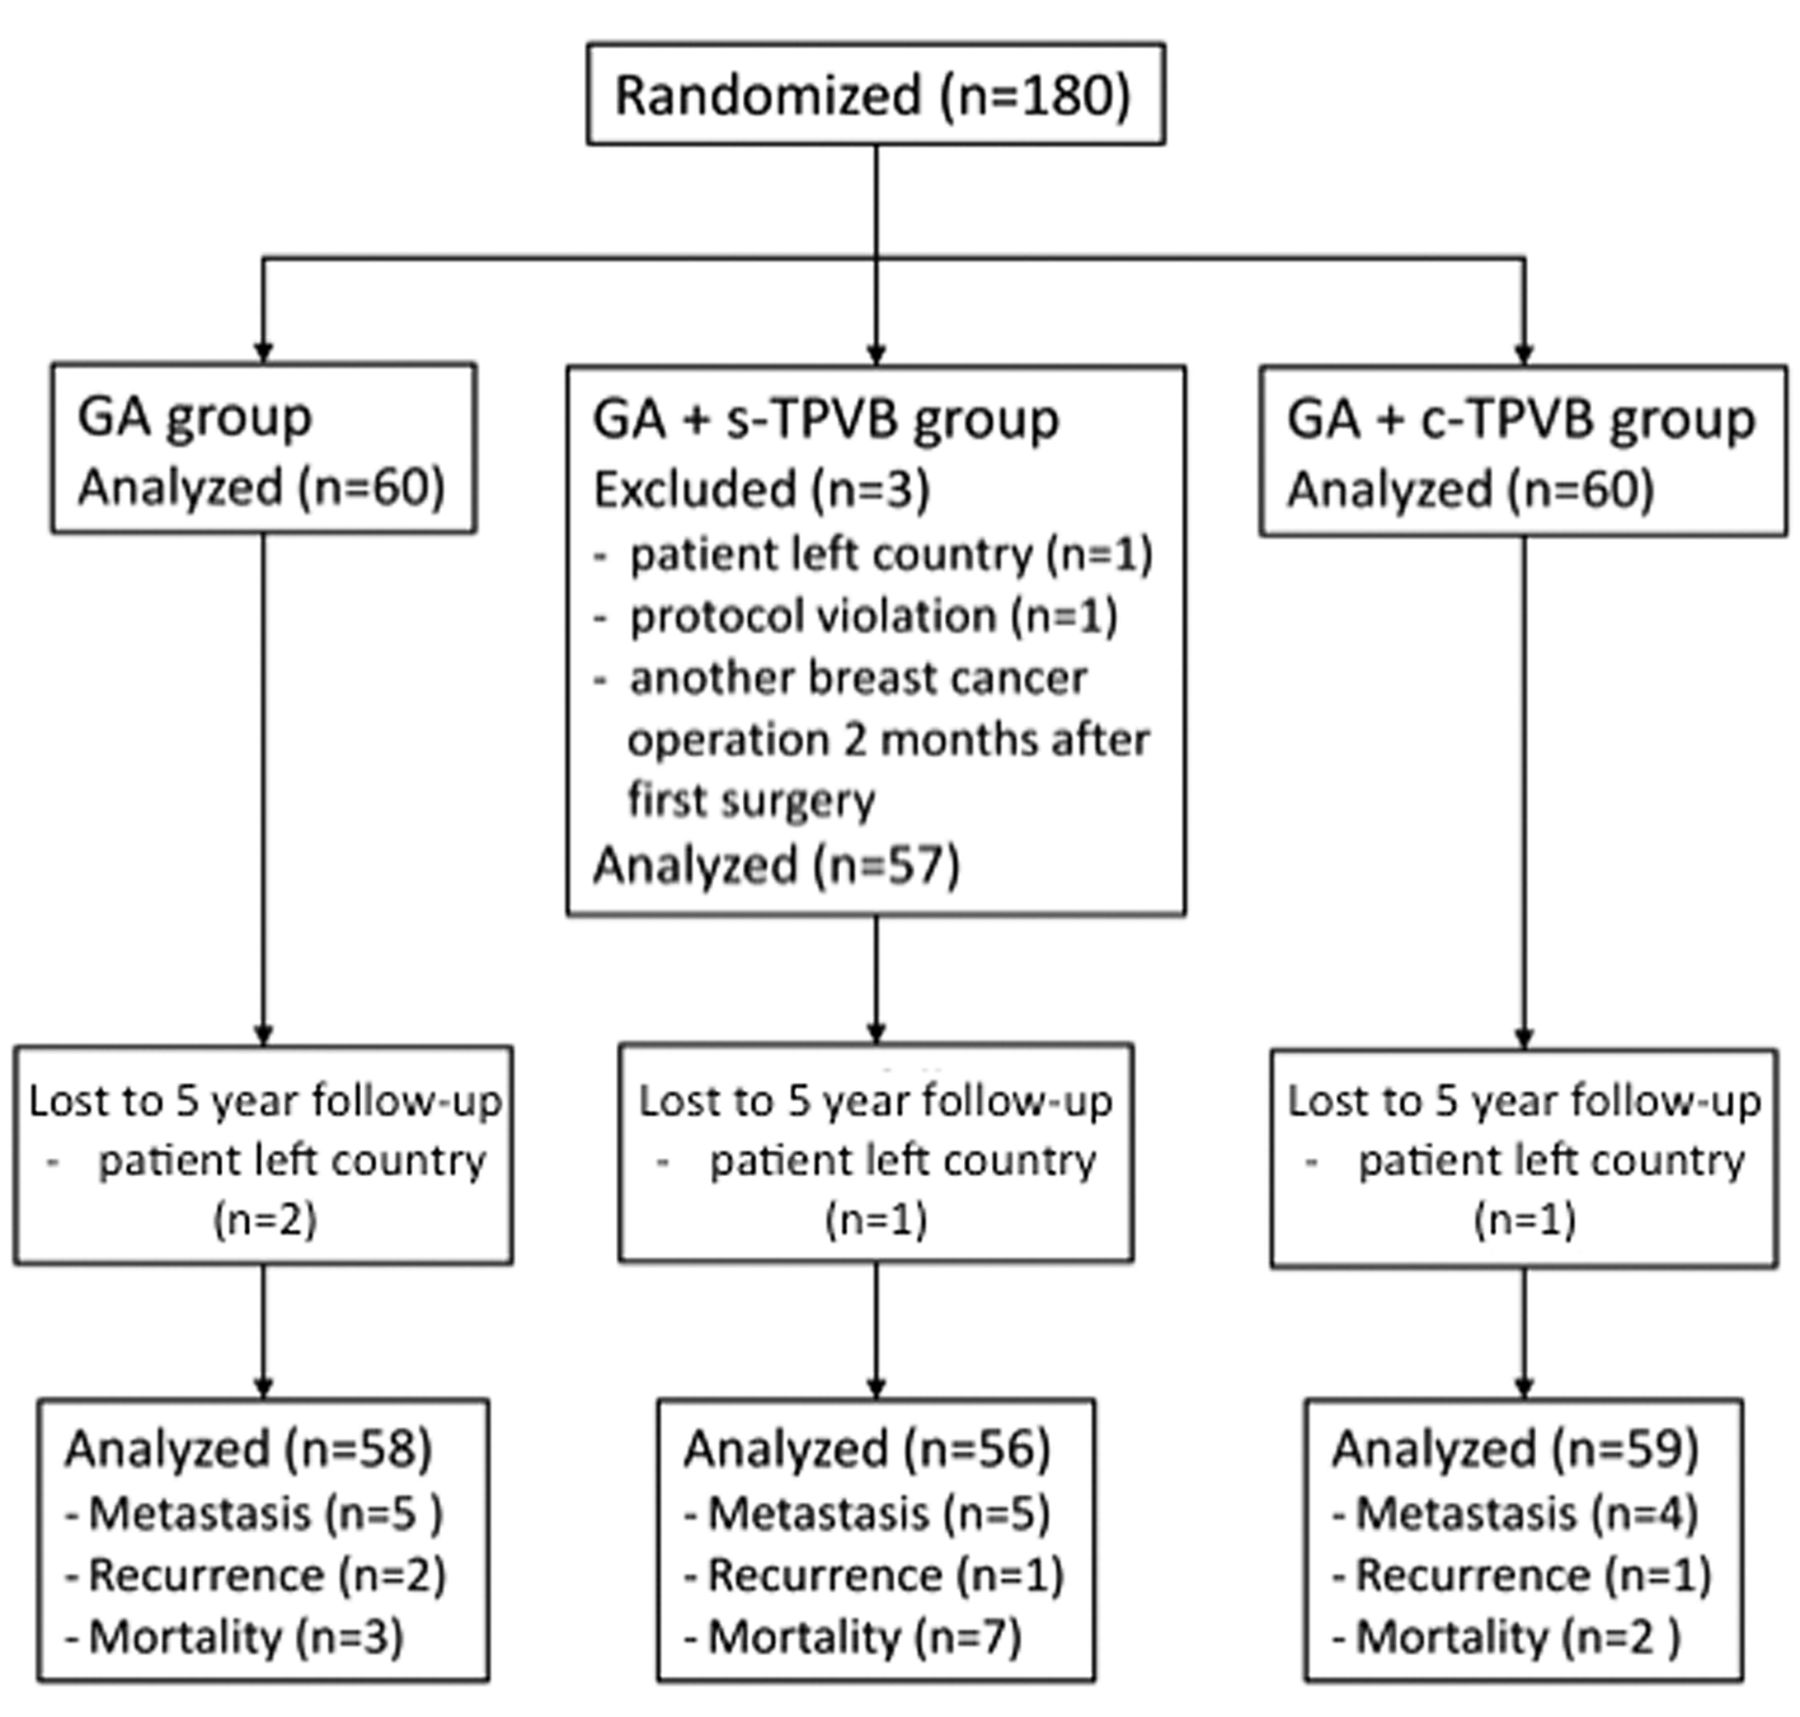 cncer breast Randomized trial control